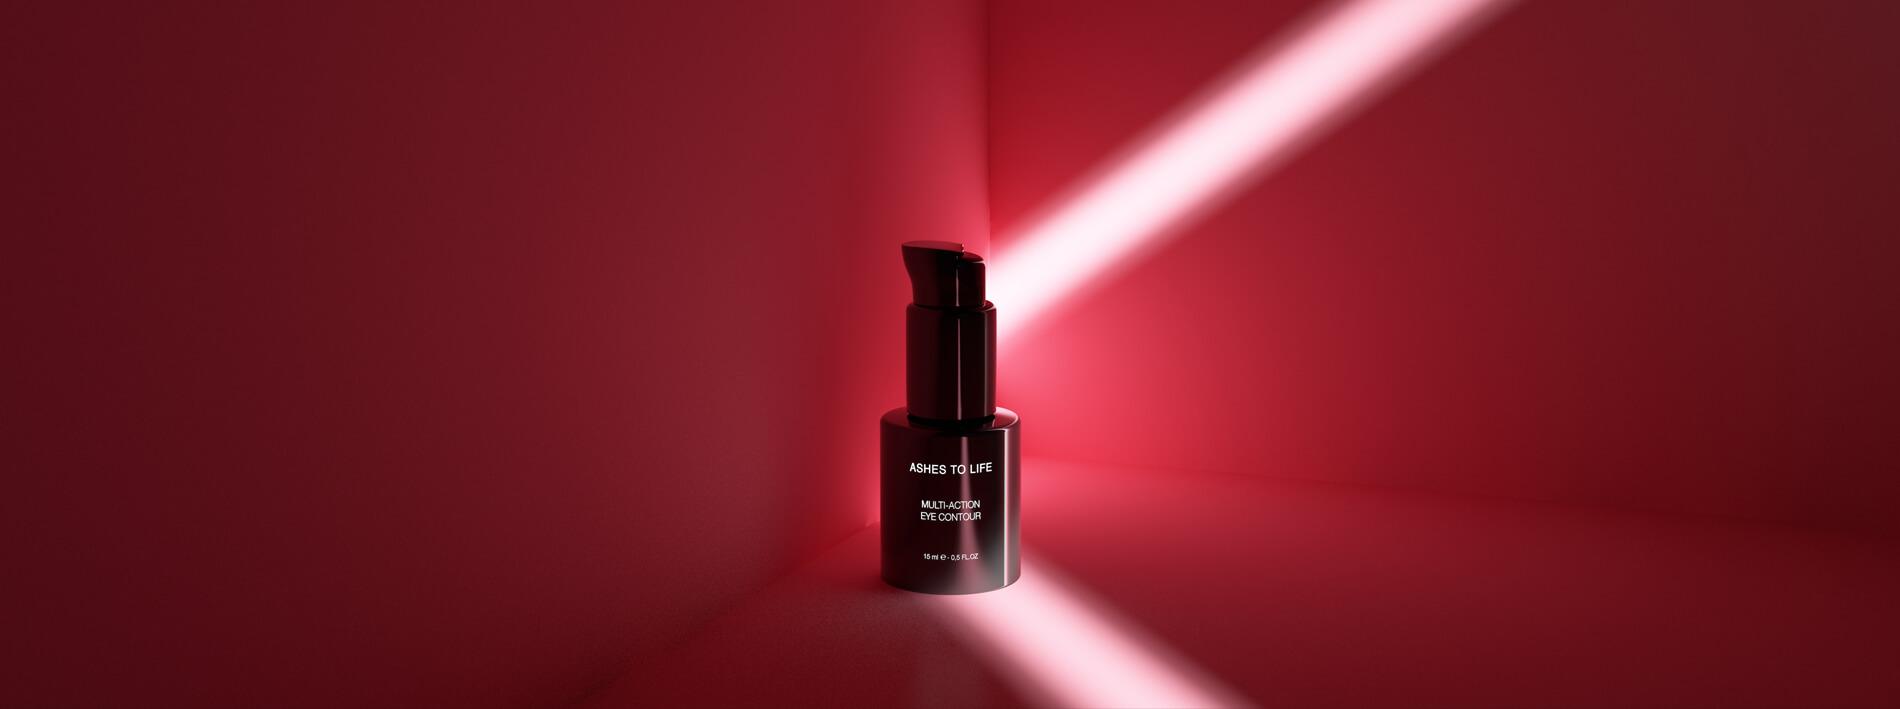 cosmetico-ecologico-radiance